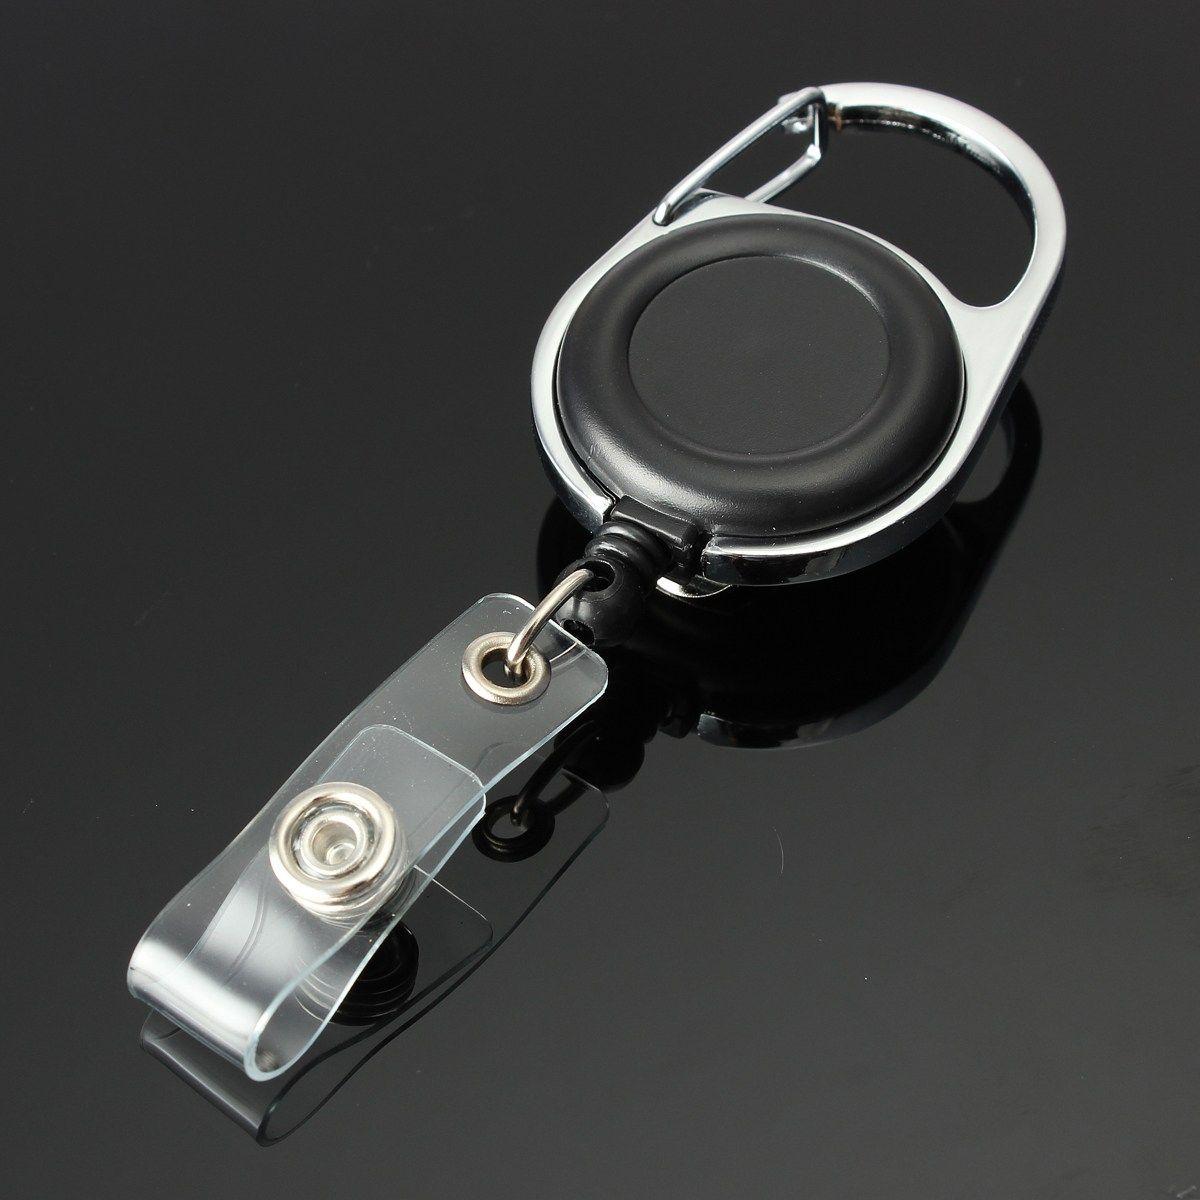 1x Retractable Reel ID Badge Lanyard Name Tag Key Card Holder Belt Clip